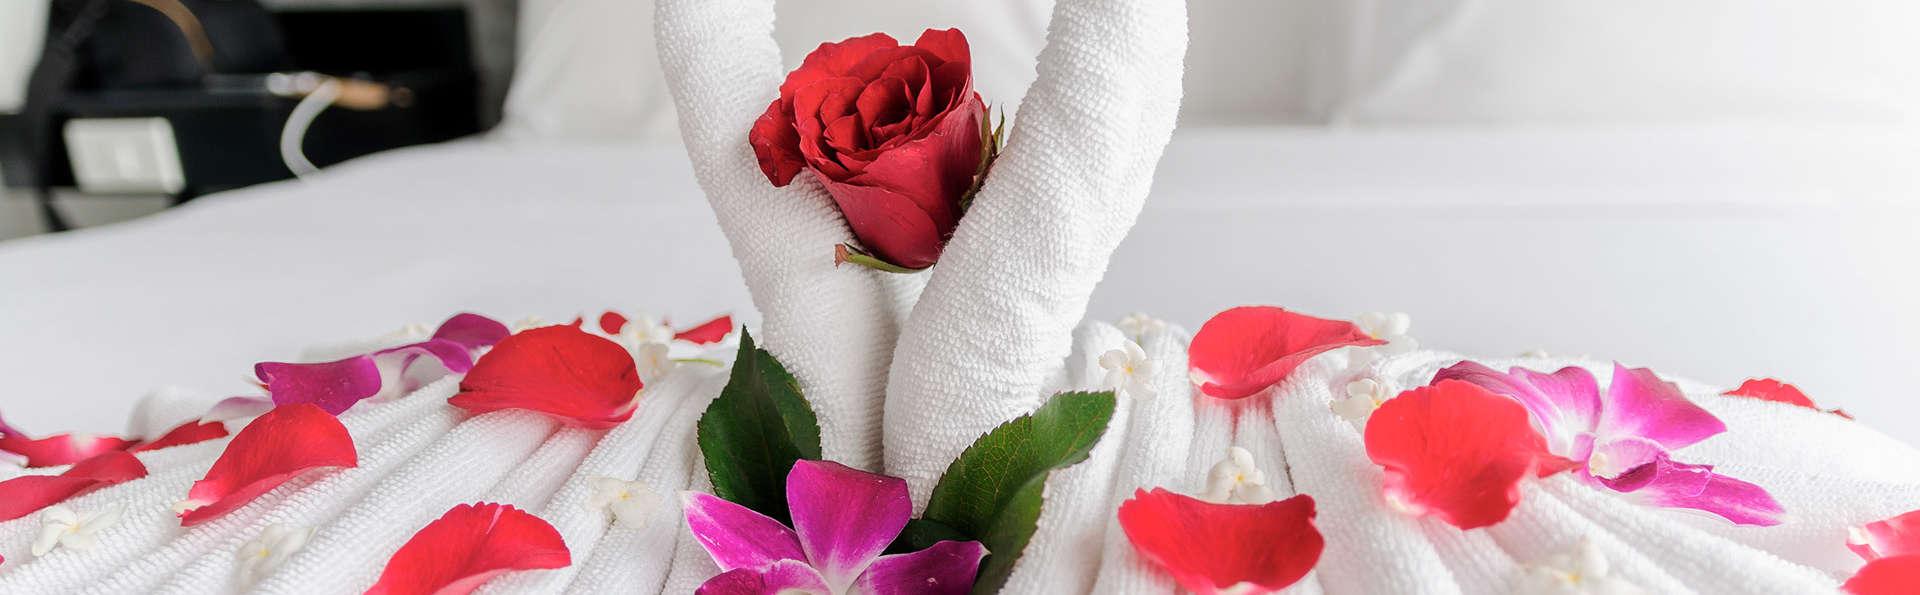 Saint-Valentin Relax & Pampering par Rituals